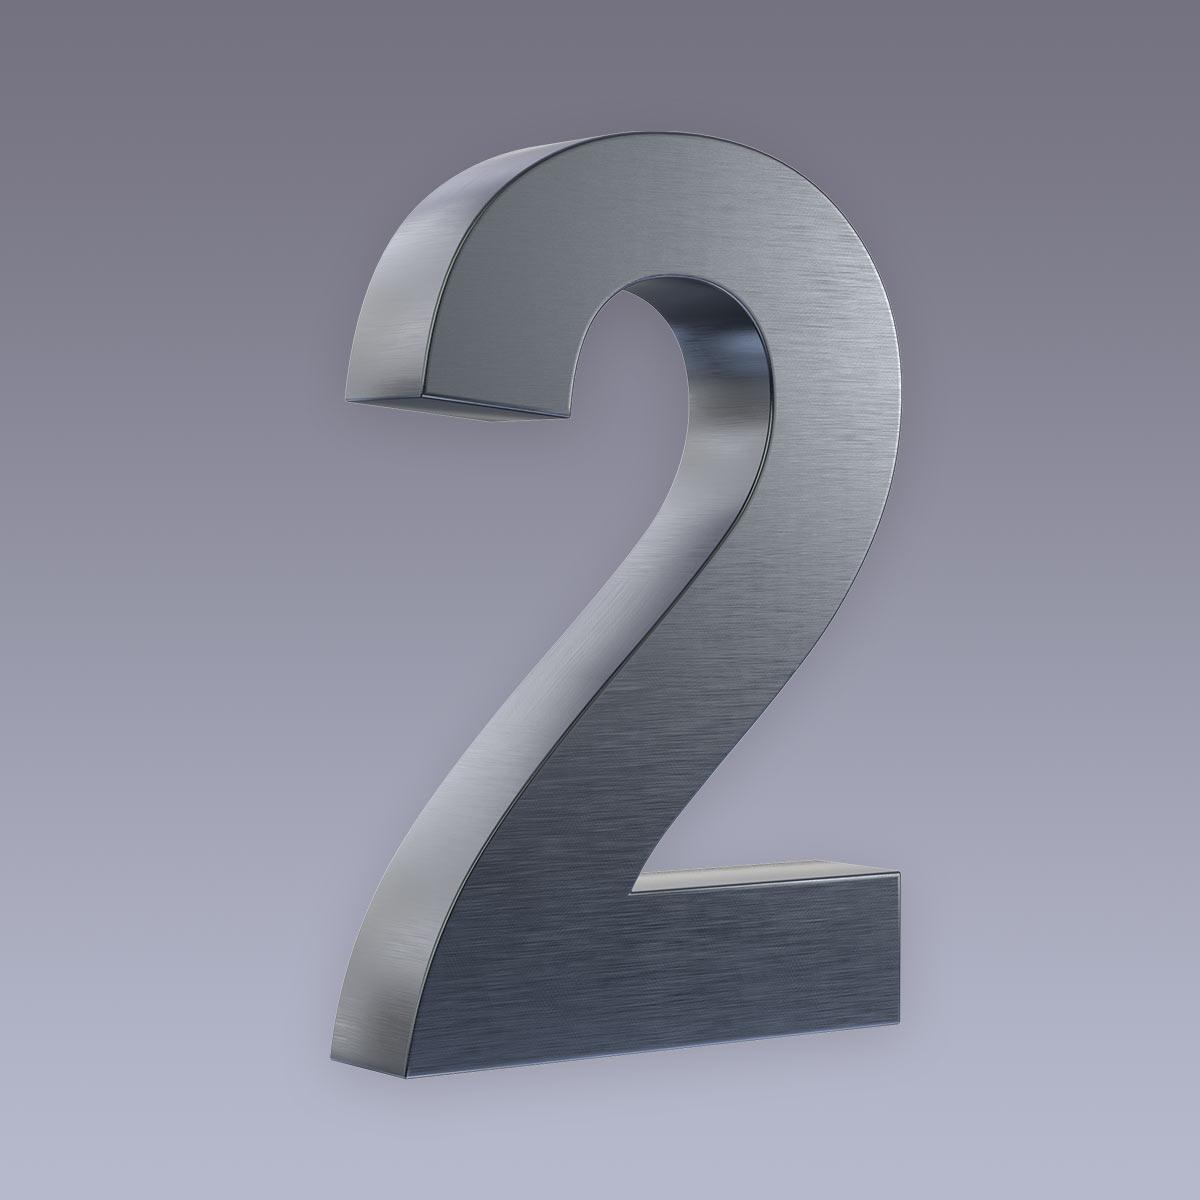 3D Hausnummer 2 Edelstahl anthrazit RAL7016 in 3D Design Arial